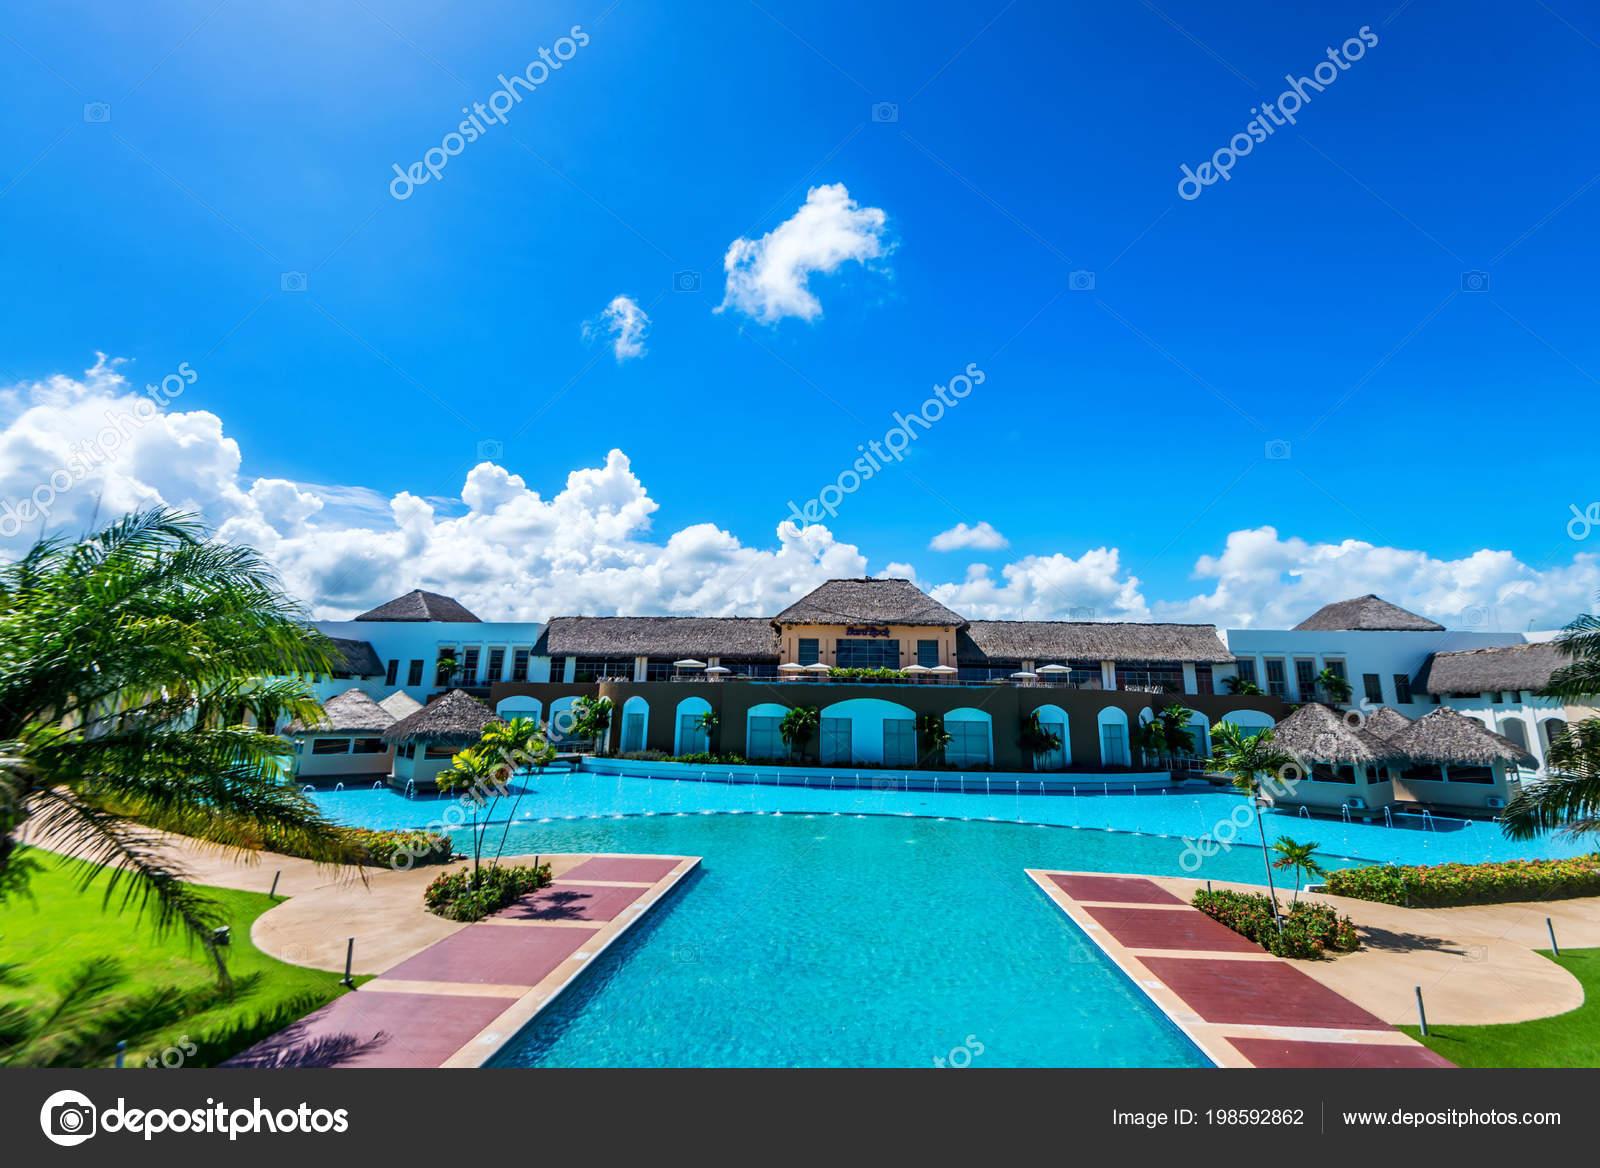 punta cana dominican republic october 31 2015 hard rock hotel